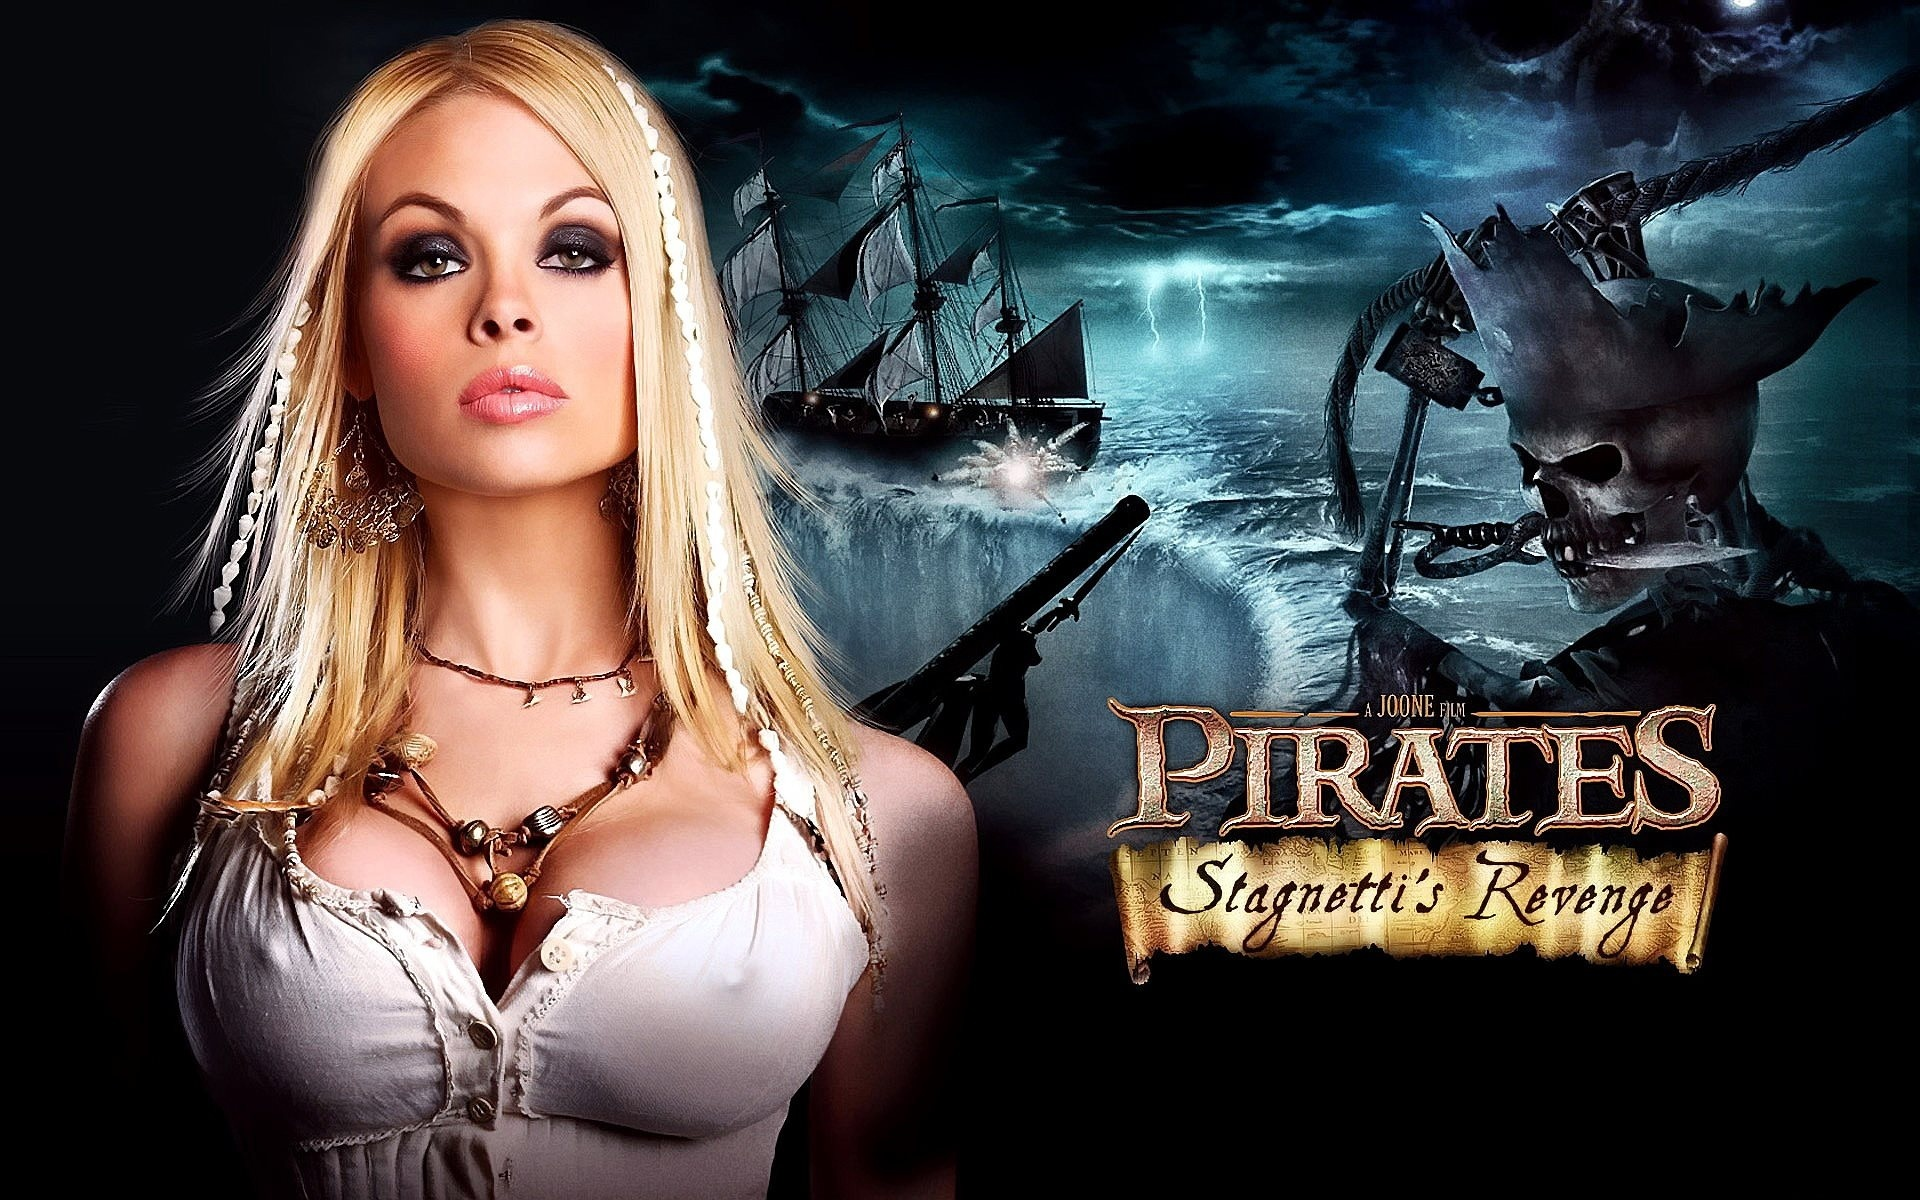 Pirati xxx sexy toons